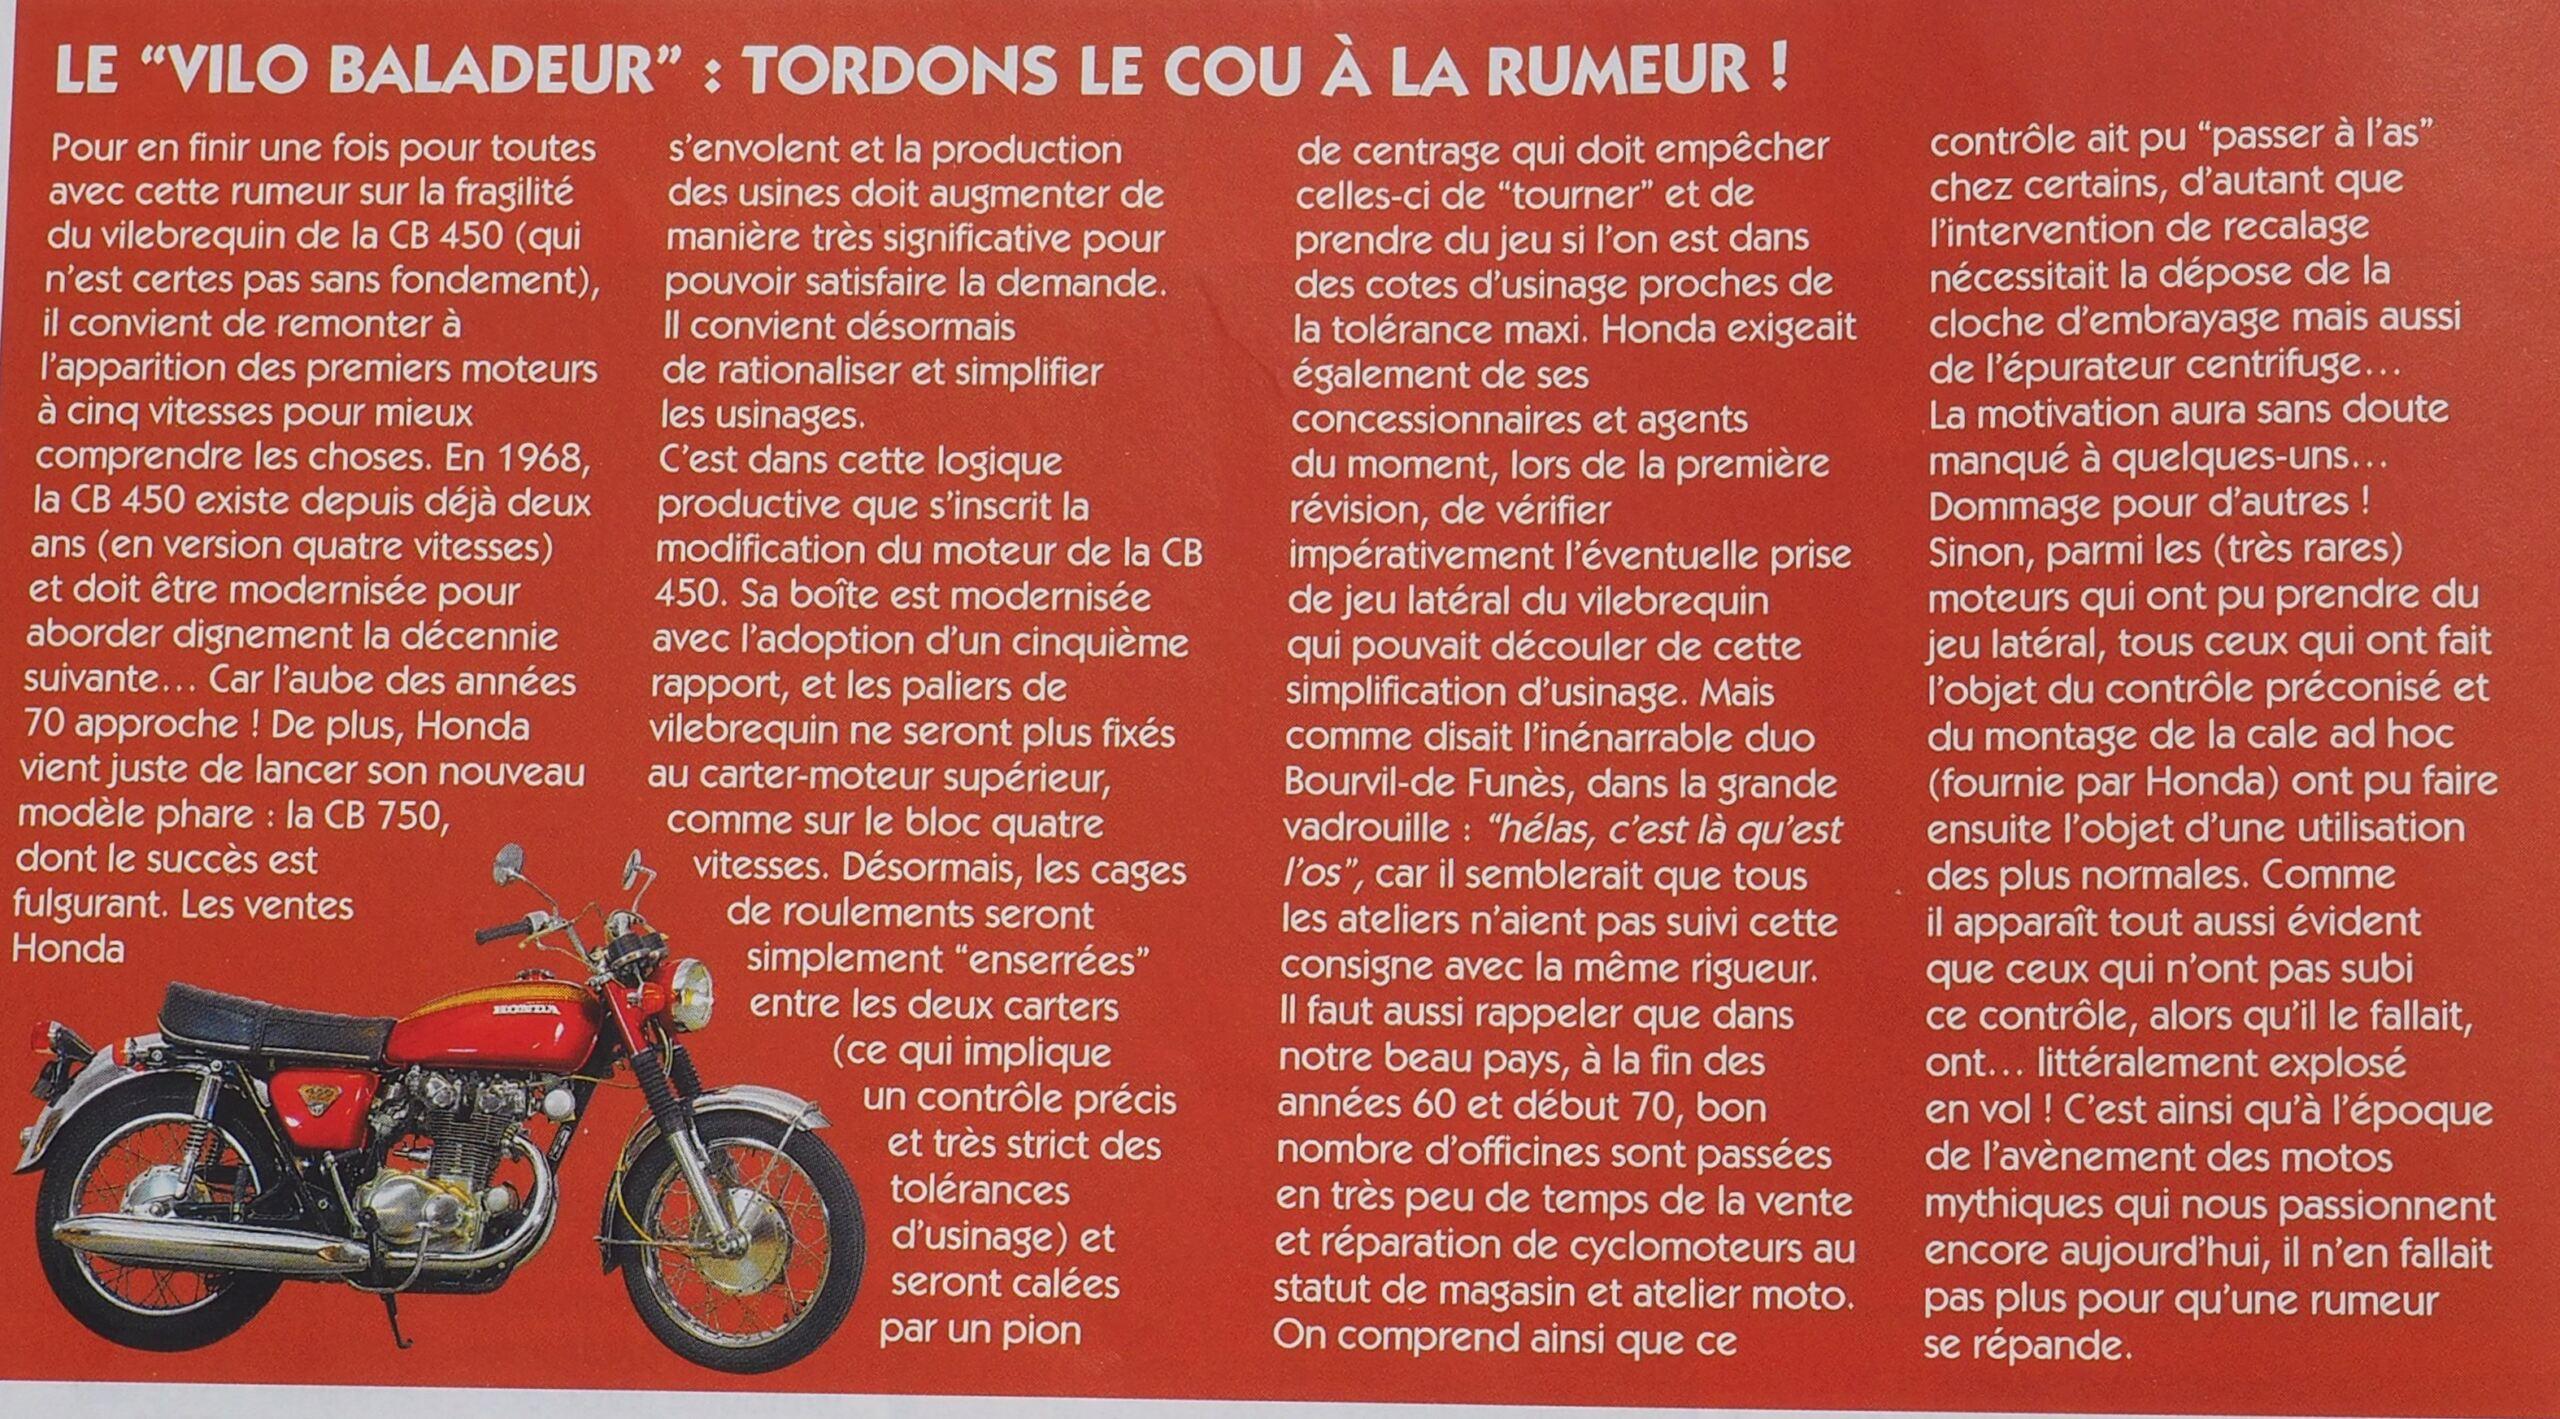 Histoire de la moto. - Page 2 P5091211